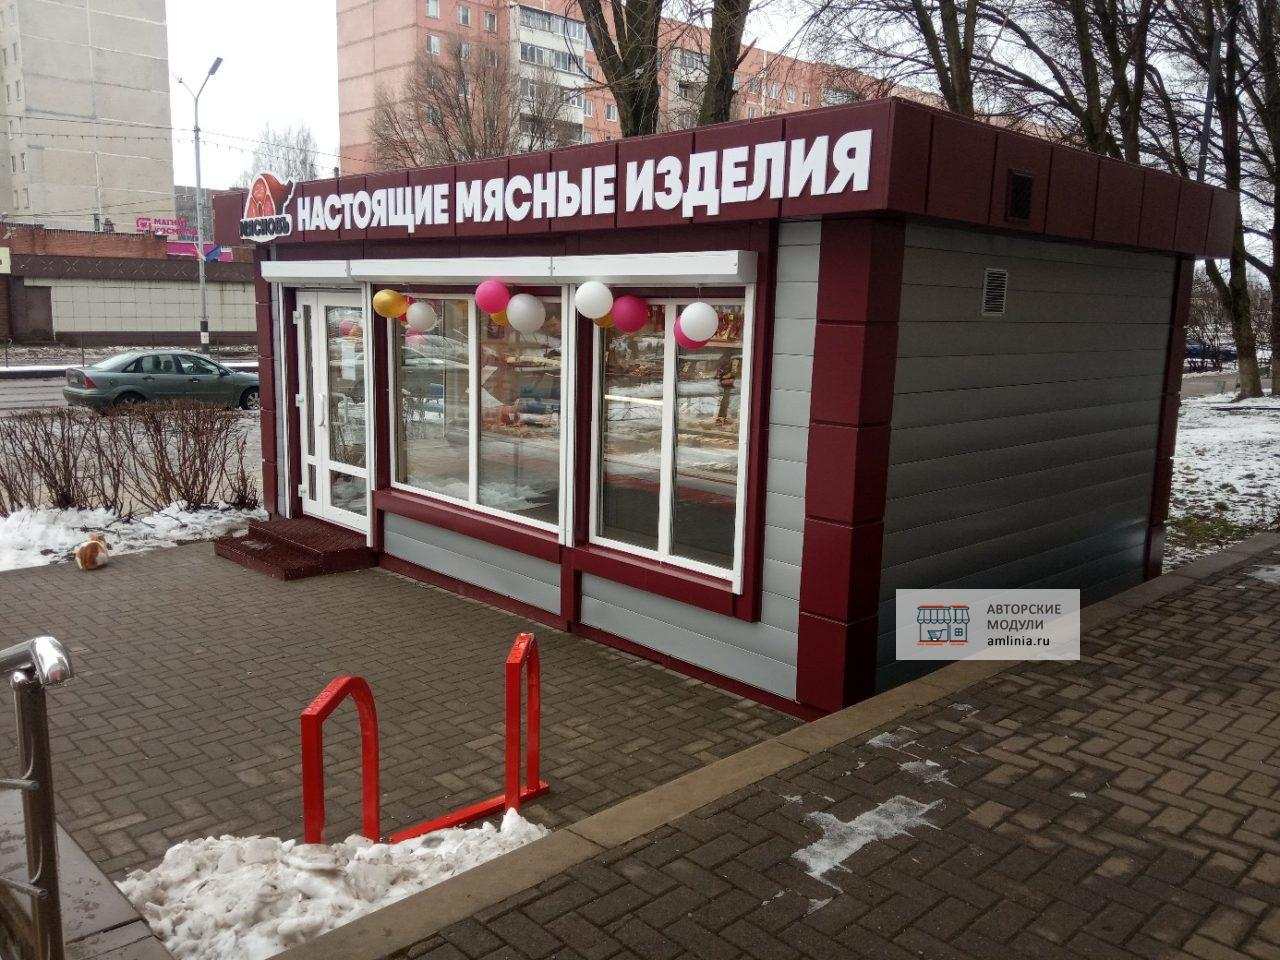 Трёхмодульный минимагазин, размеры 7,5 х 5,0 х 2,87 метра